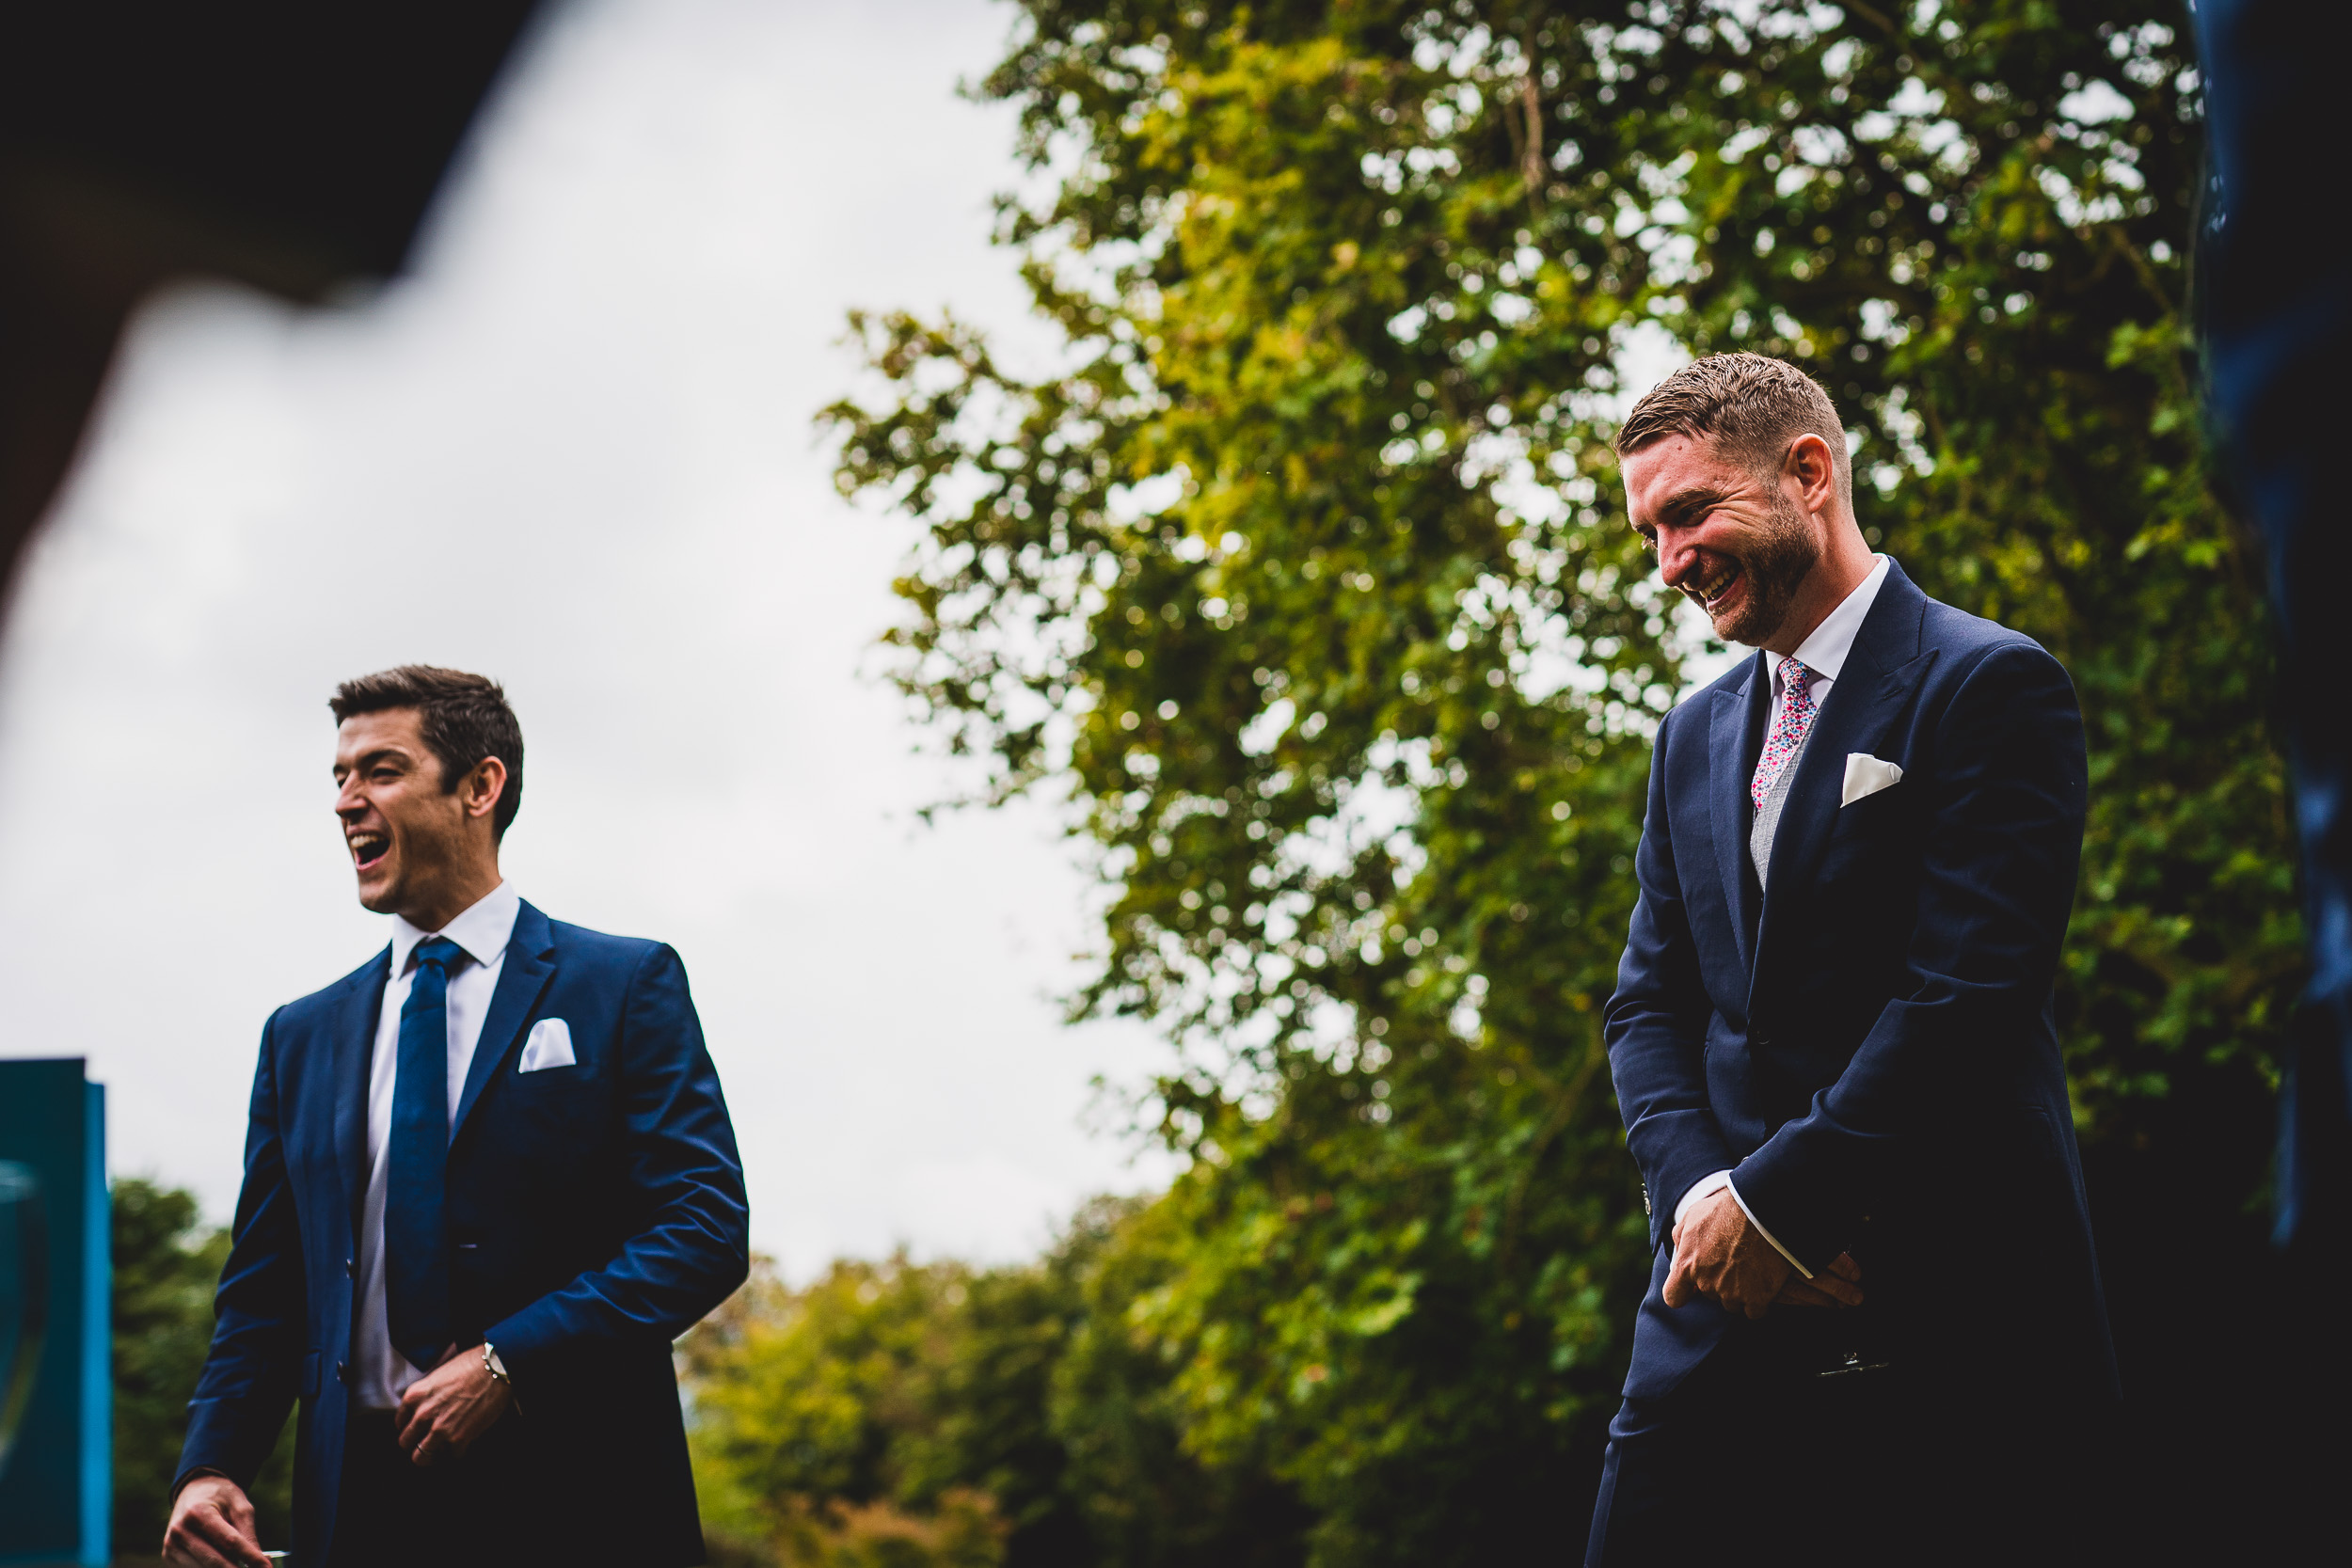 Voewood Wedding Photography | Al & Clancy Al ss 018